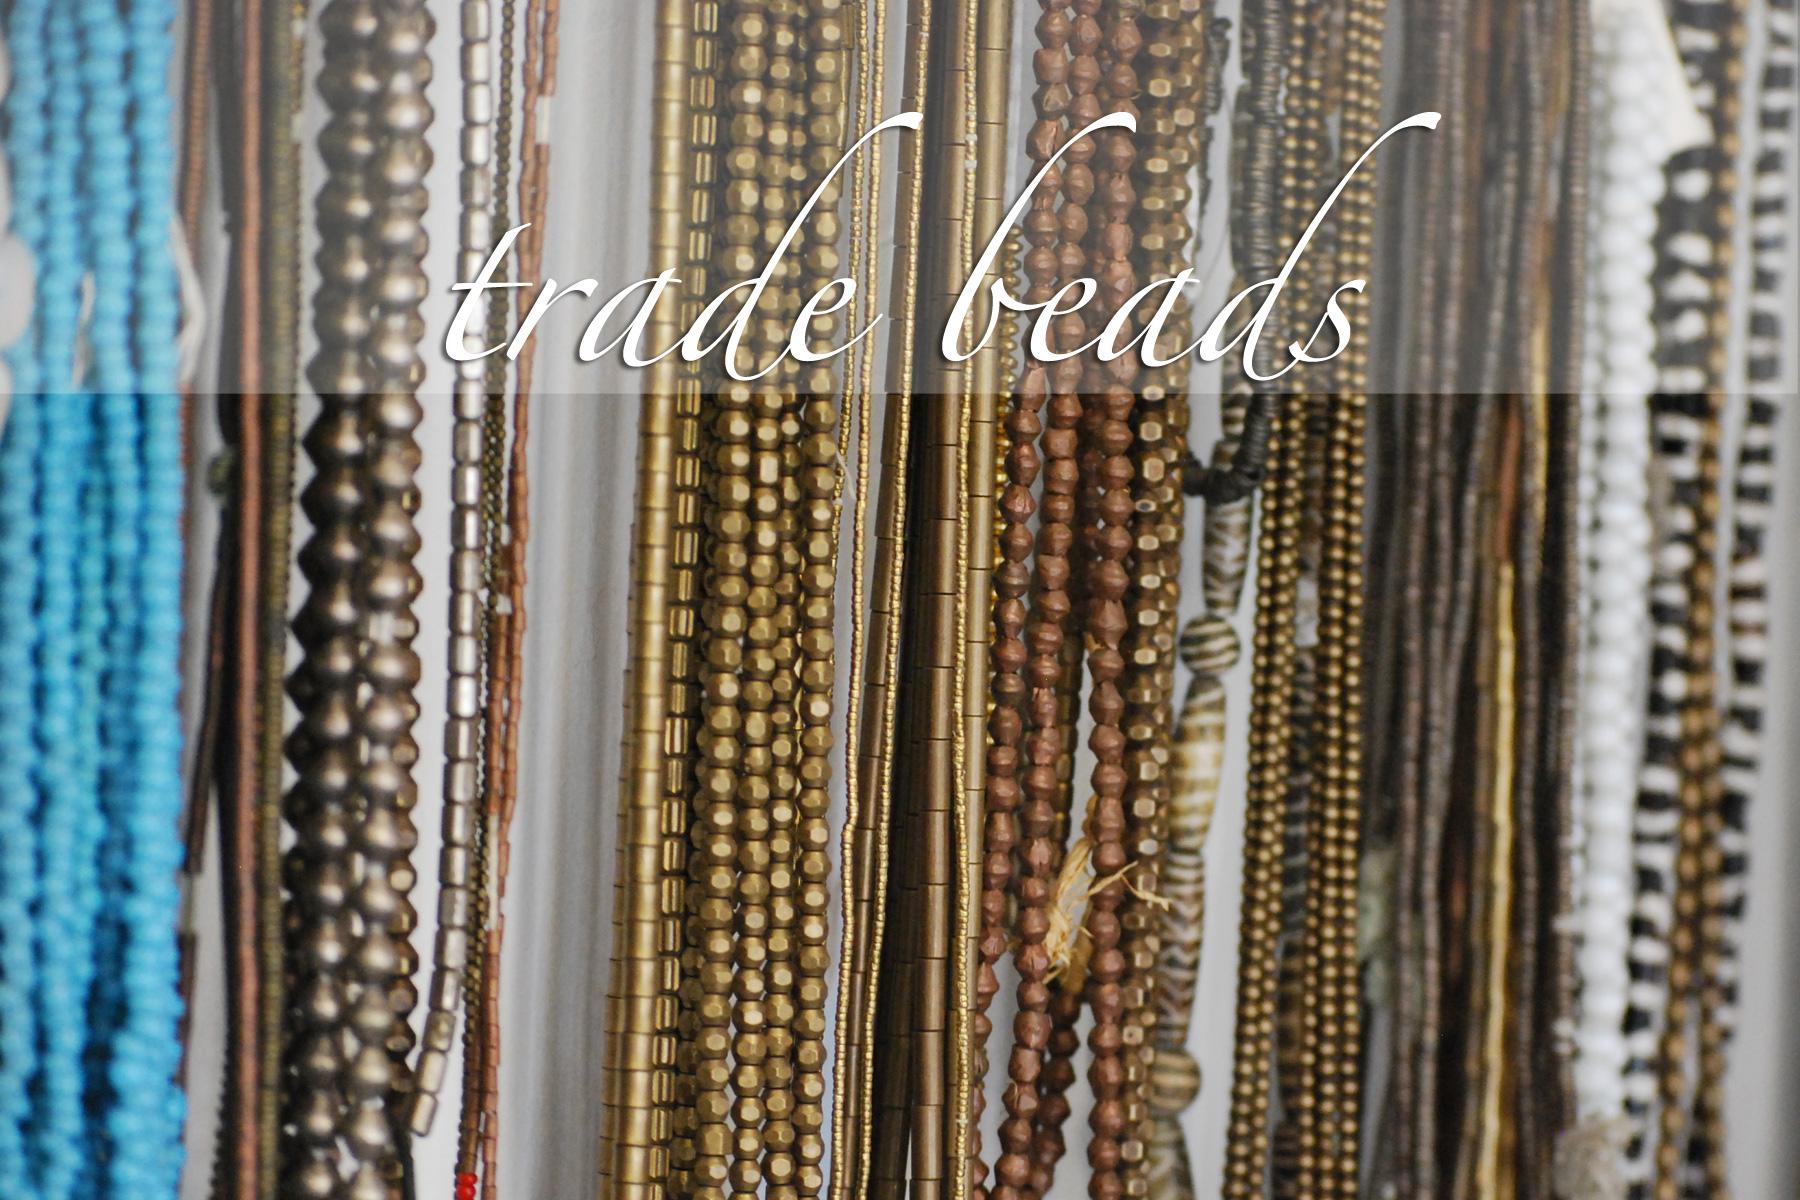 cpal-slide-show-hanging-beads-in-shop-3-revisedA.jpg